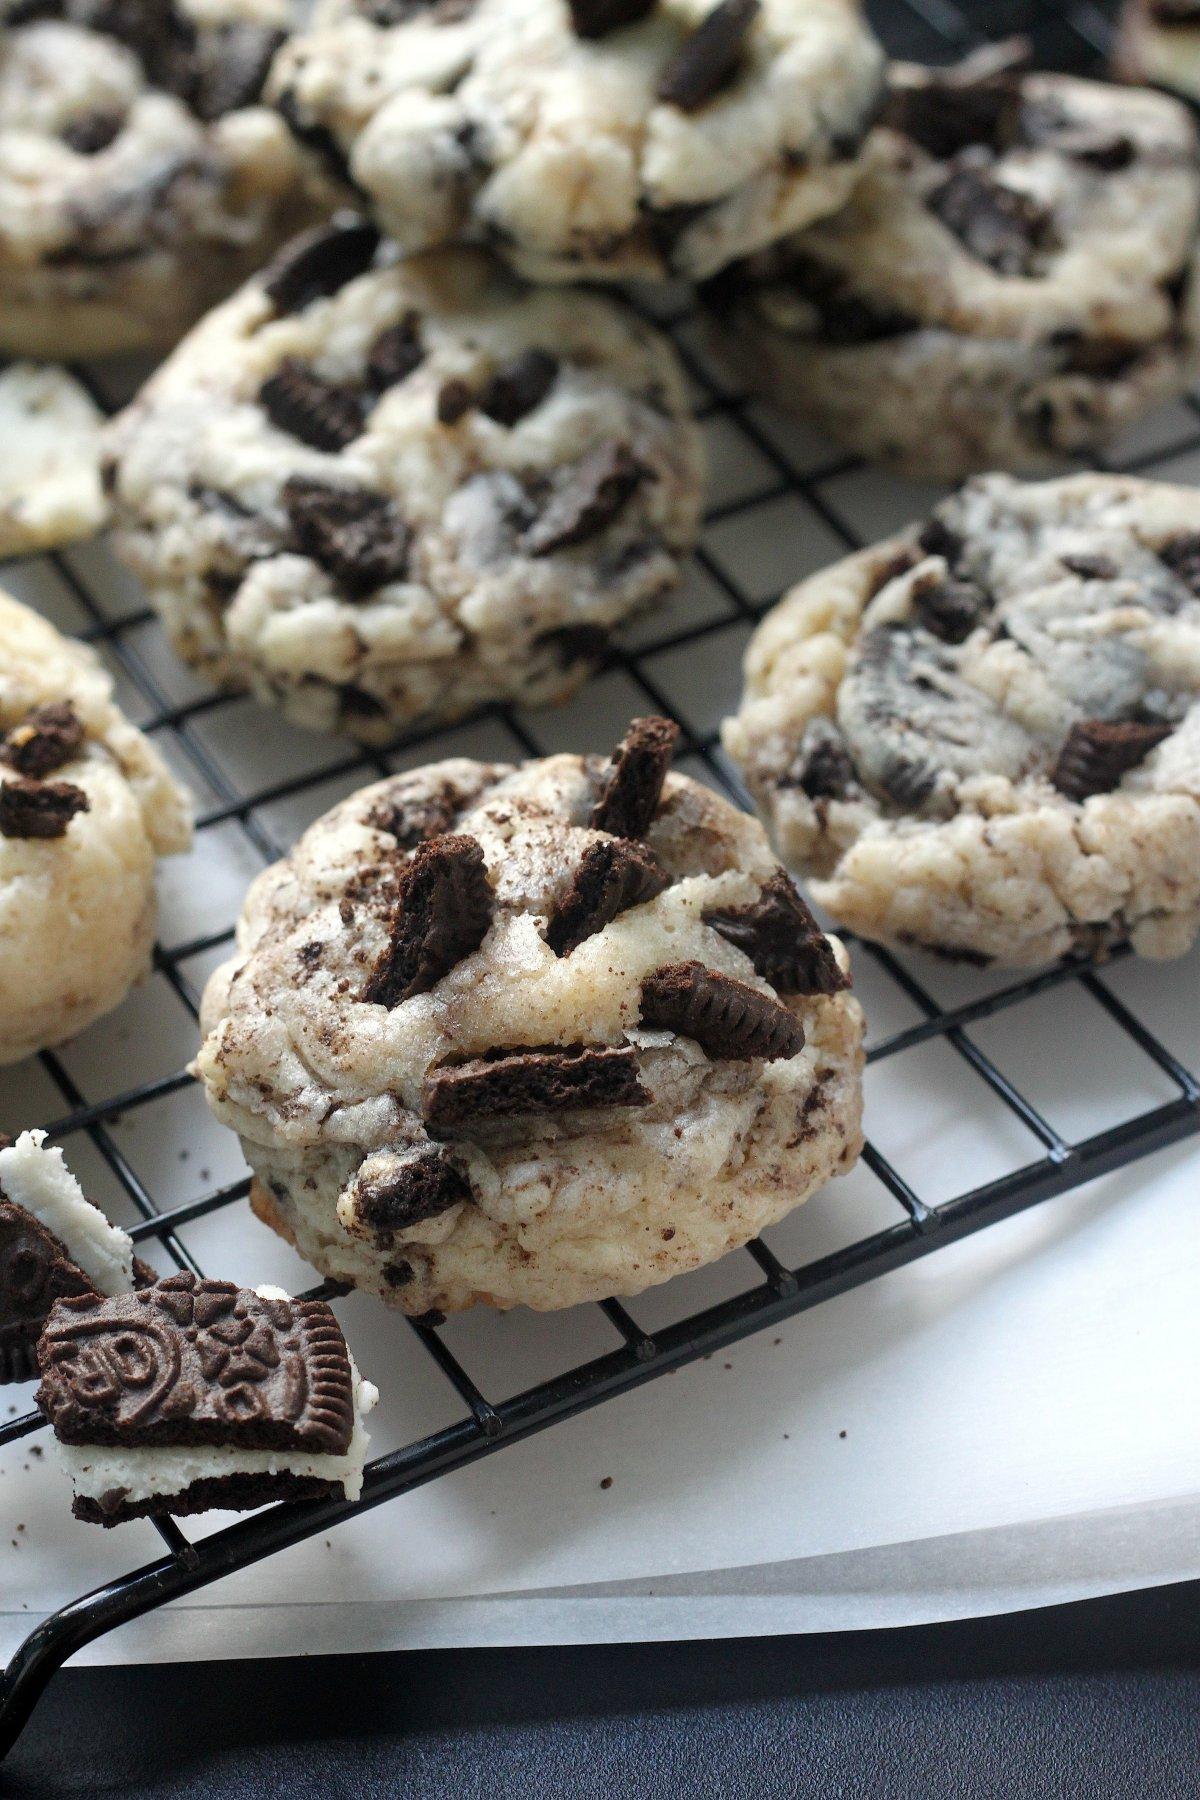 Recipe of oreo cookies